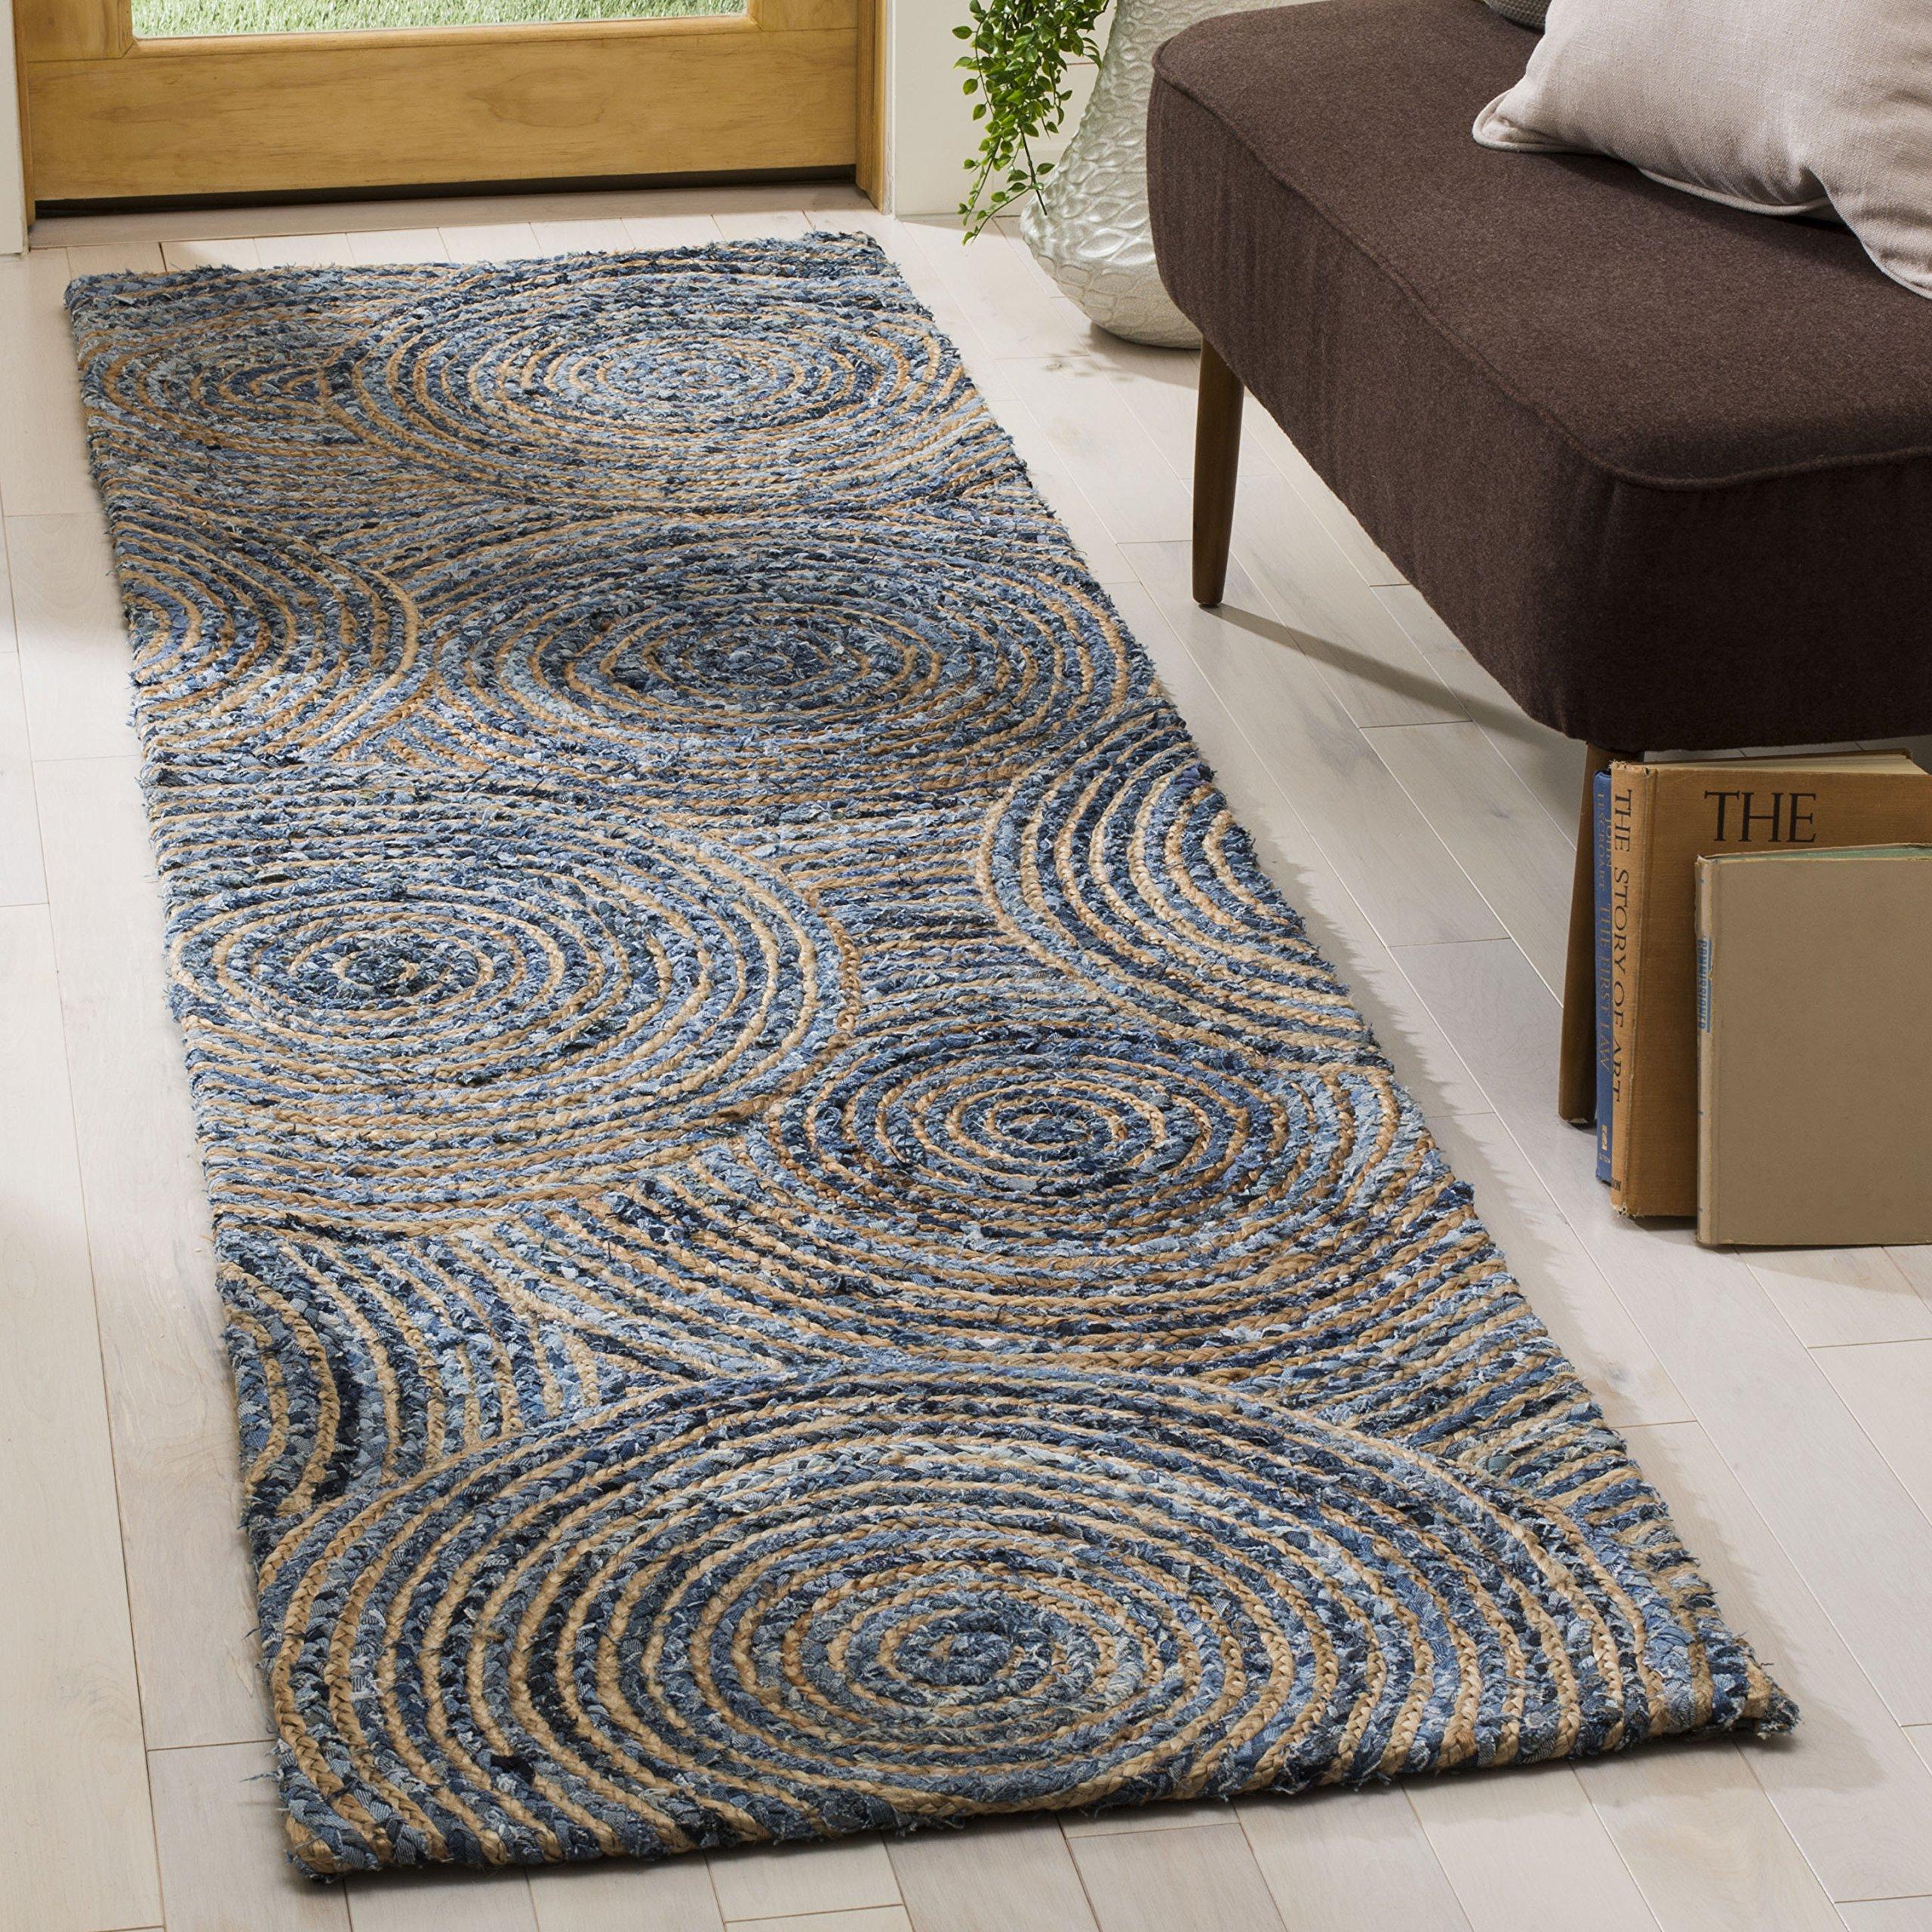 Safavieh CAP603A-28 Cape Cod Collection Flat Weave Handmade Runner, 2'3 x 8', Natural/Denim